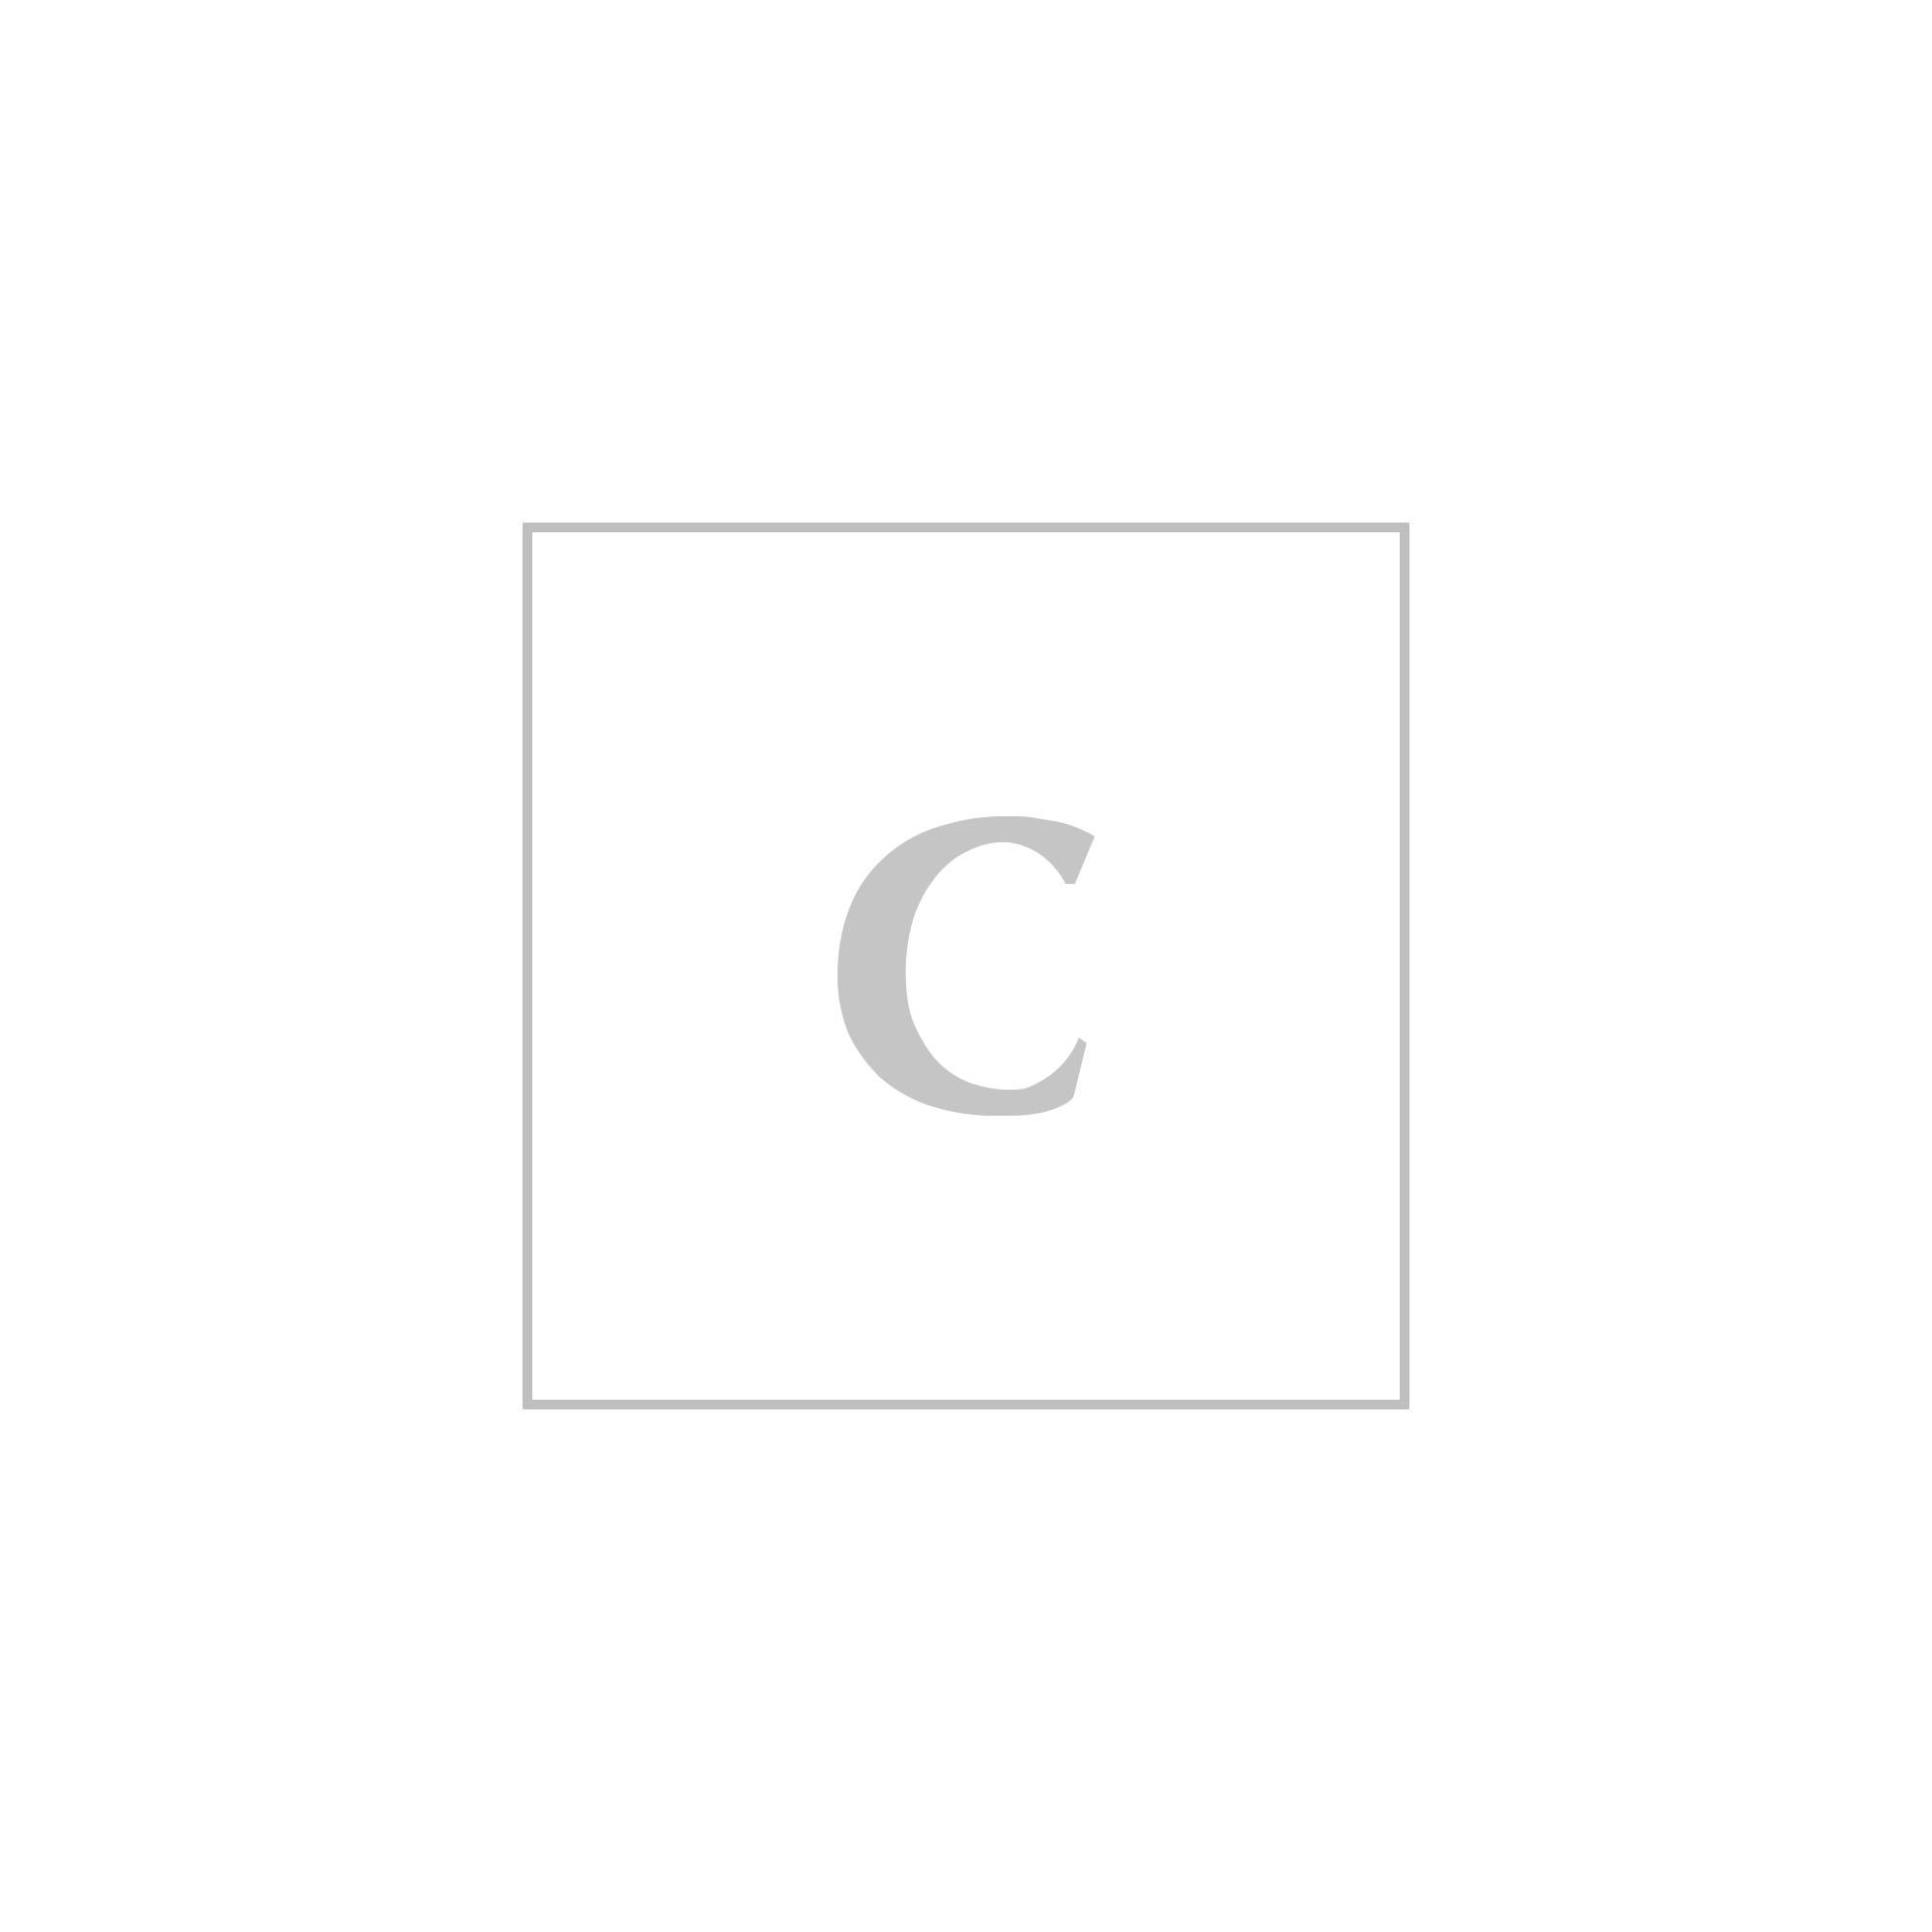 Dolce & gabbana portafoglio continental dauphine